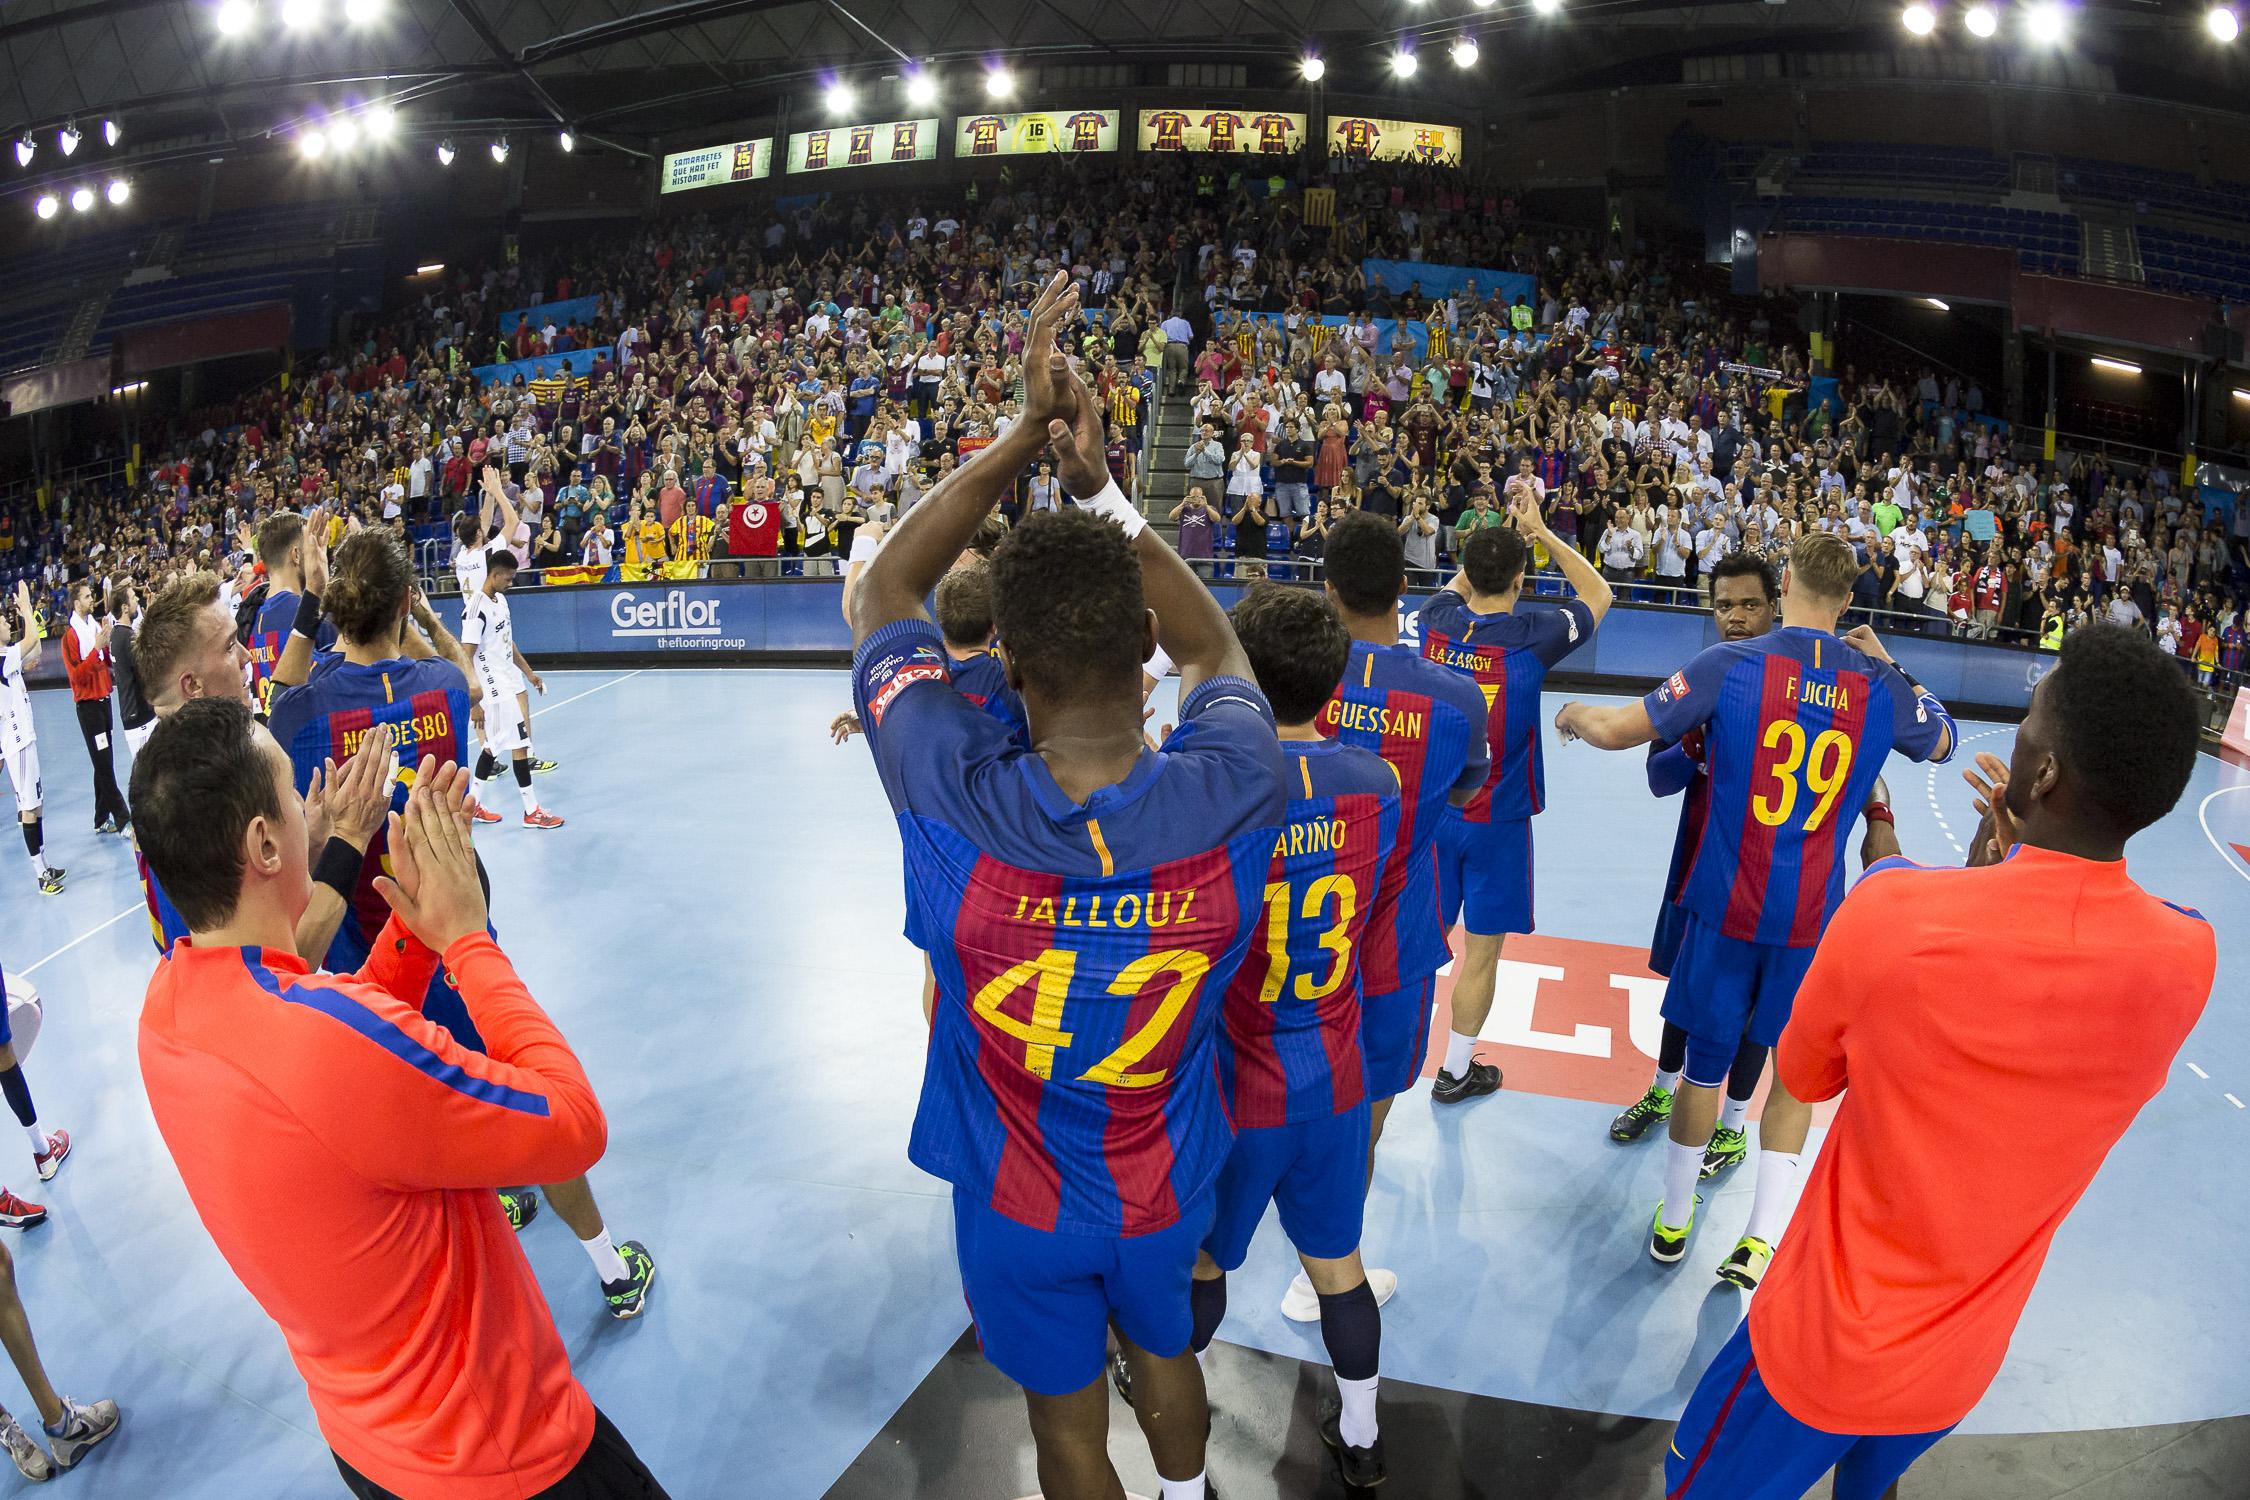 portfolio20161001-handball-cl-barca-thw-kiel-1145-6v0a0075